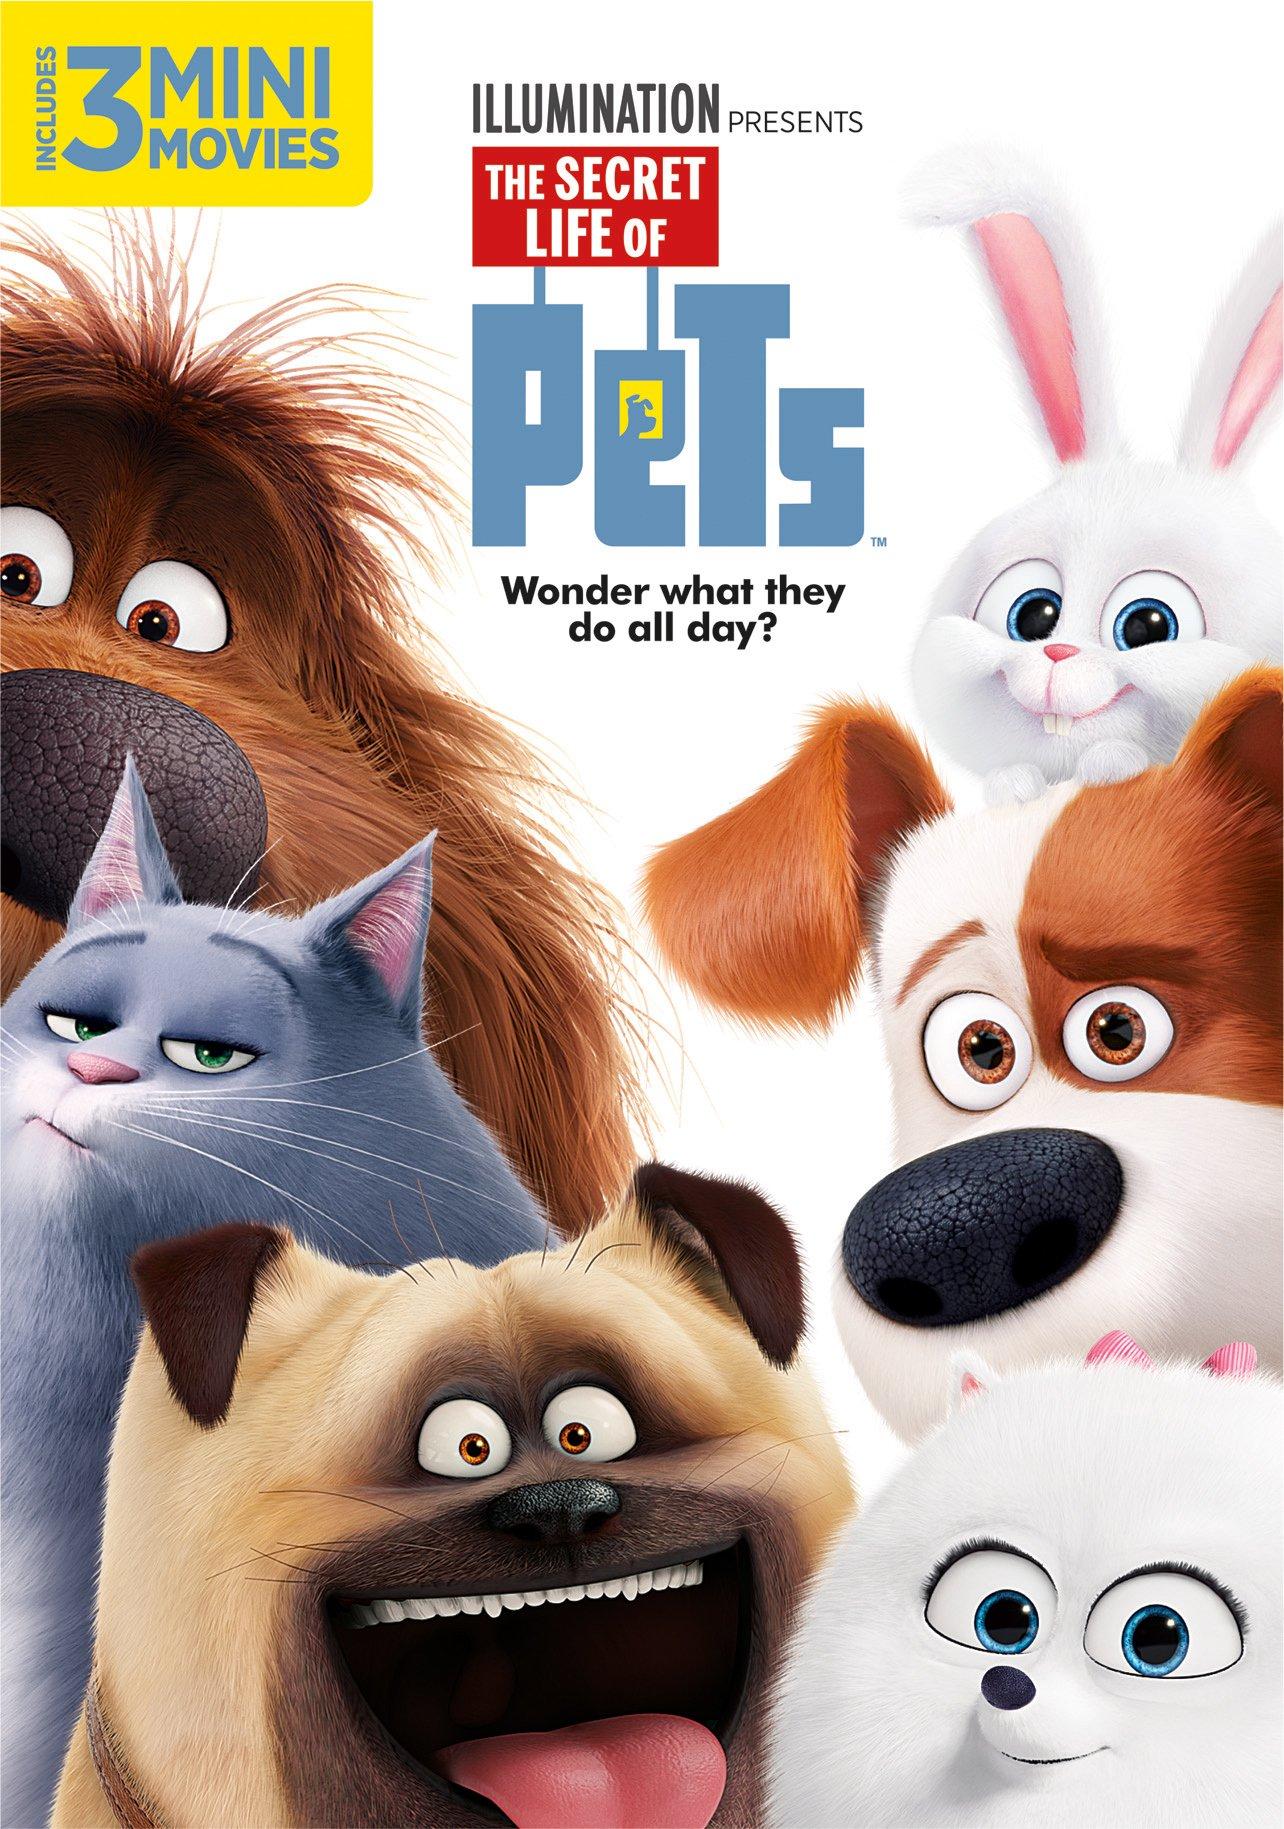 Buy Secret Life Of Pets Dvd Now!